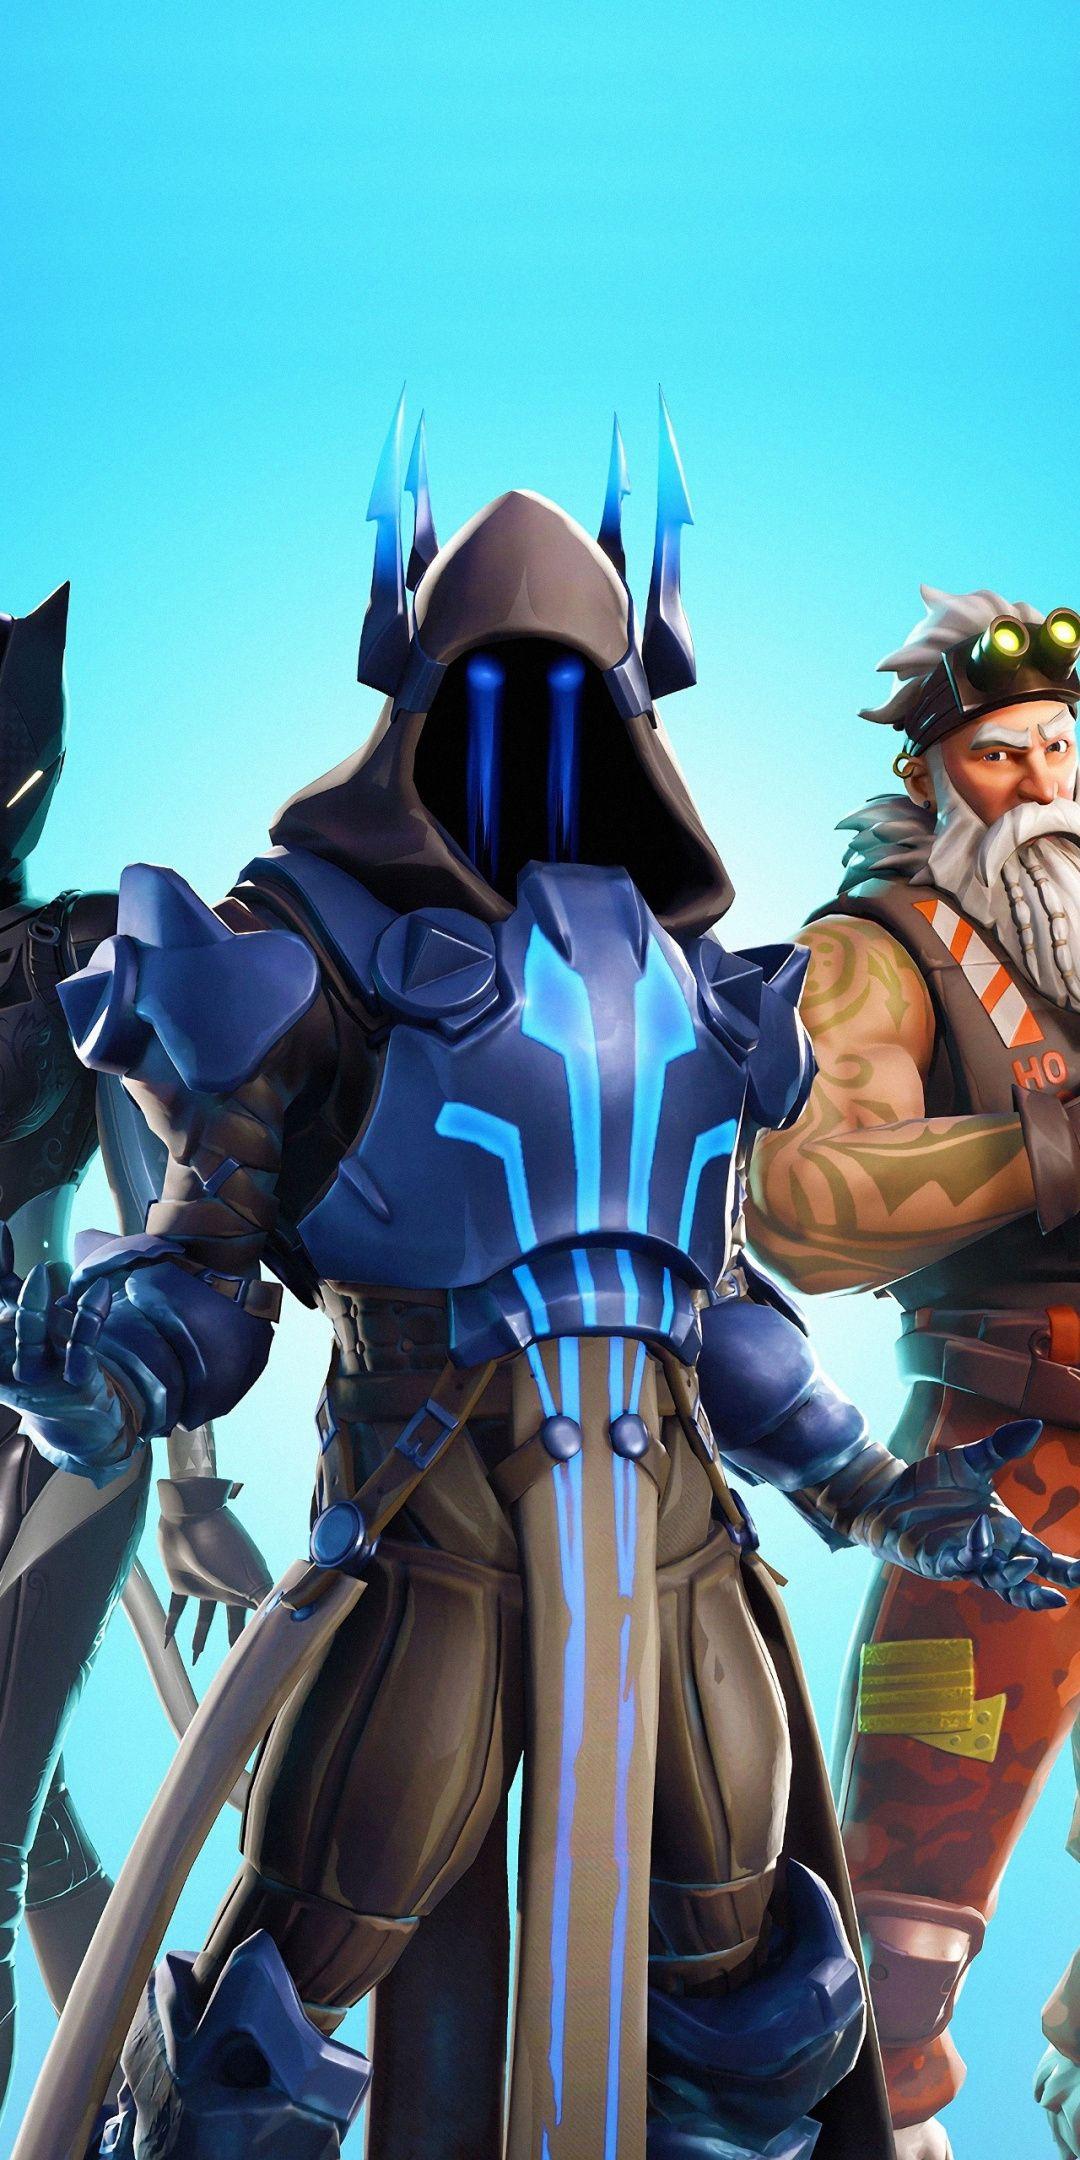 Popular Video Game Fortnite Season 7 2018 1080x2160 Wallpaper Video Game Fortnite Wallpaper